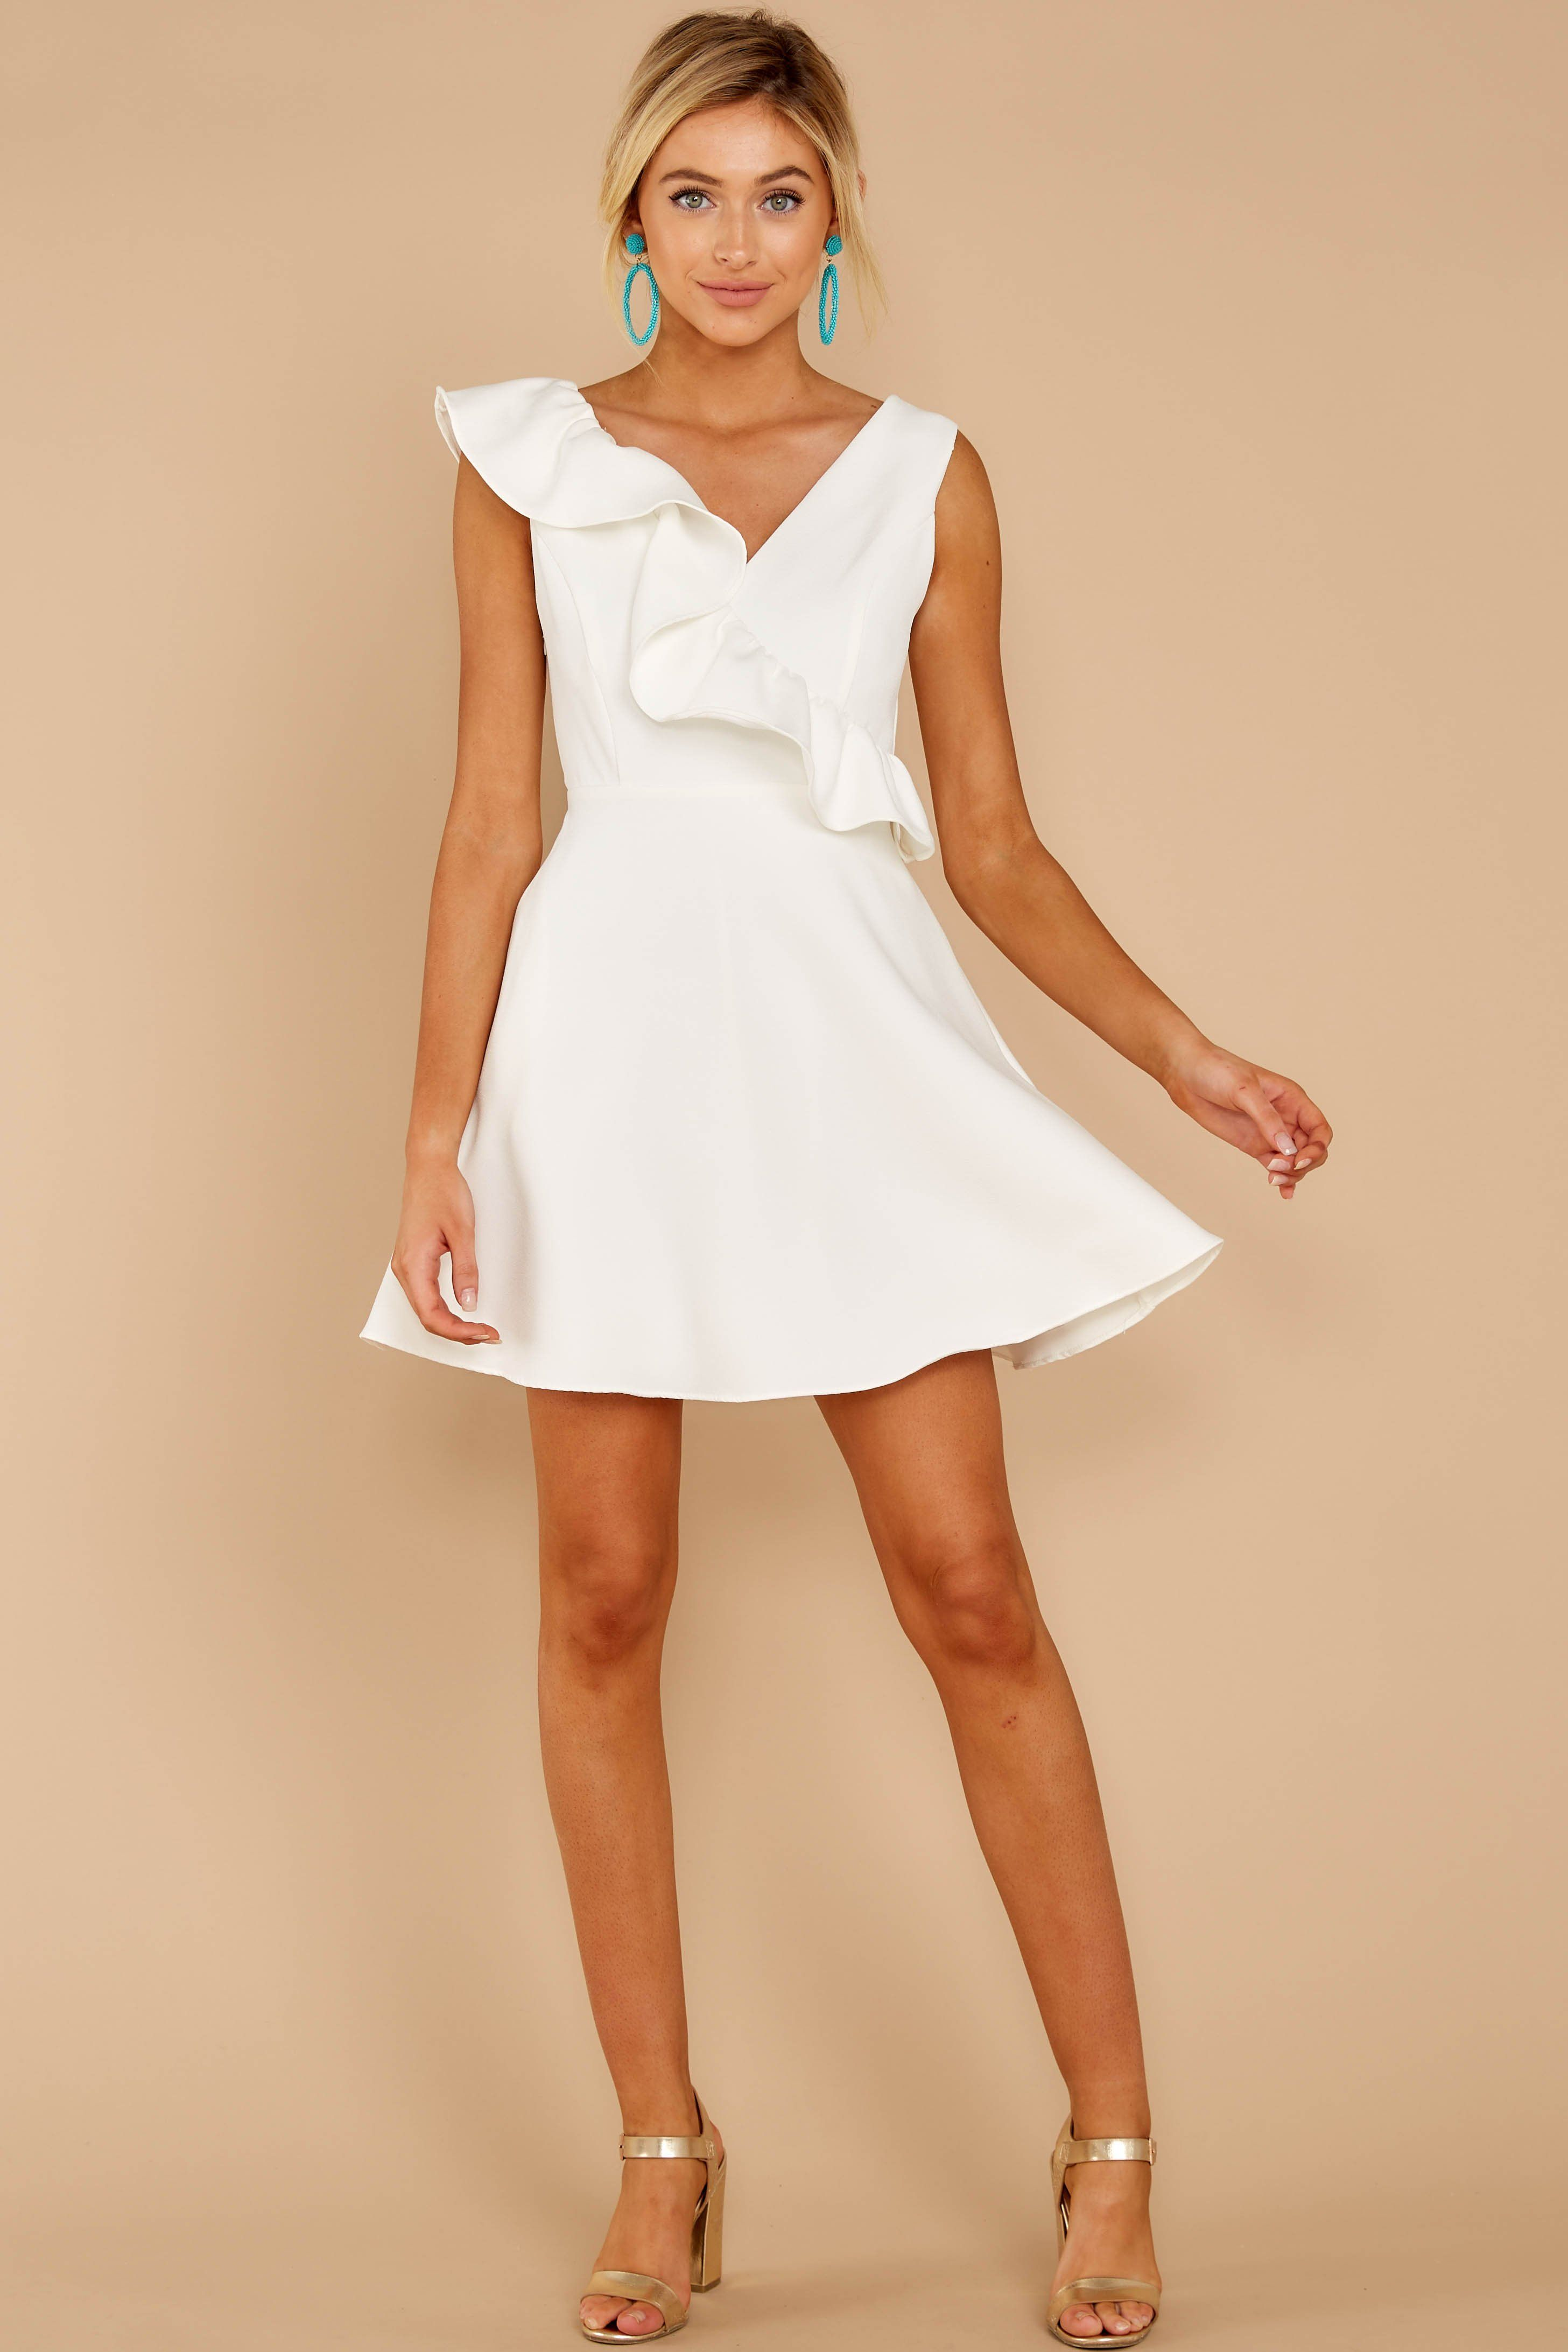 Chic Sleeveless White Dress Short Ruffled Dress Dress 46 00 Red Dress Shop Red Dress Red Dress Sorority Dresses [ 4369 x 2913 Pixel ]